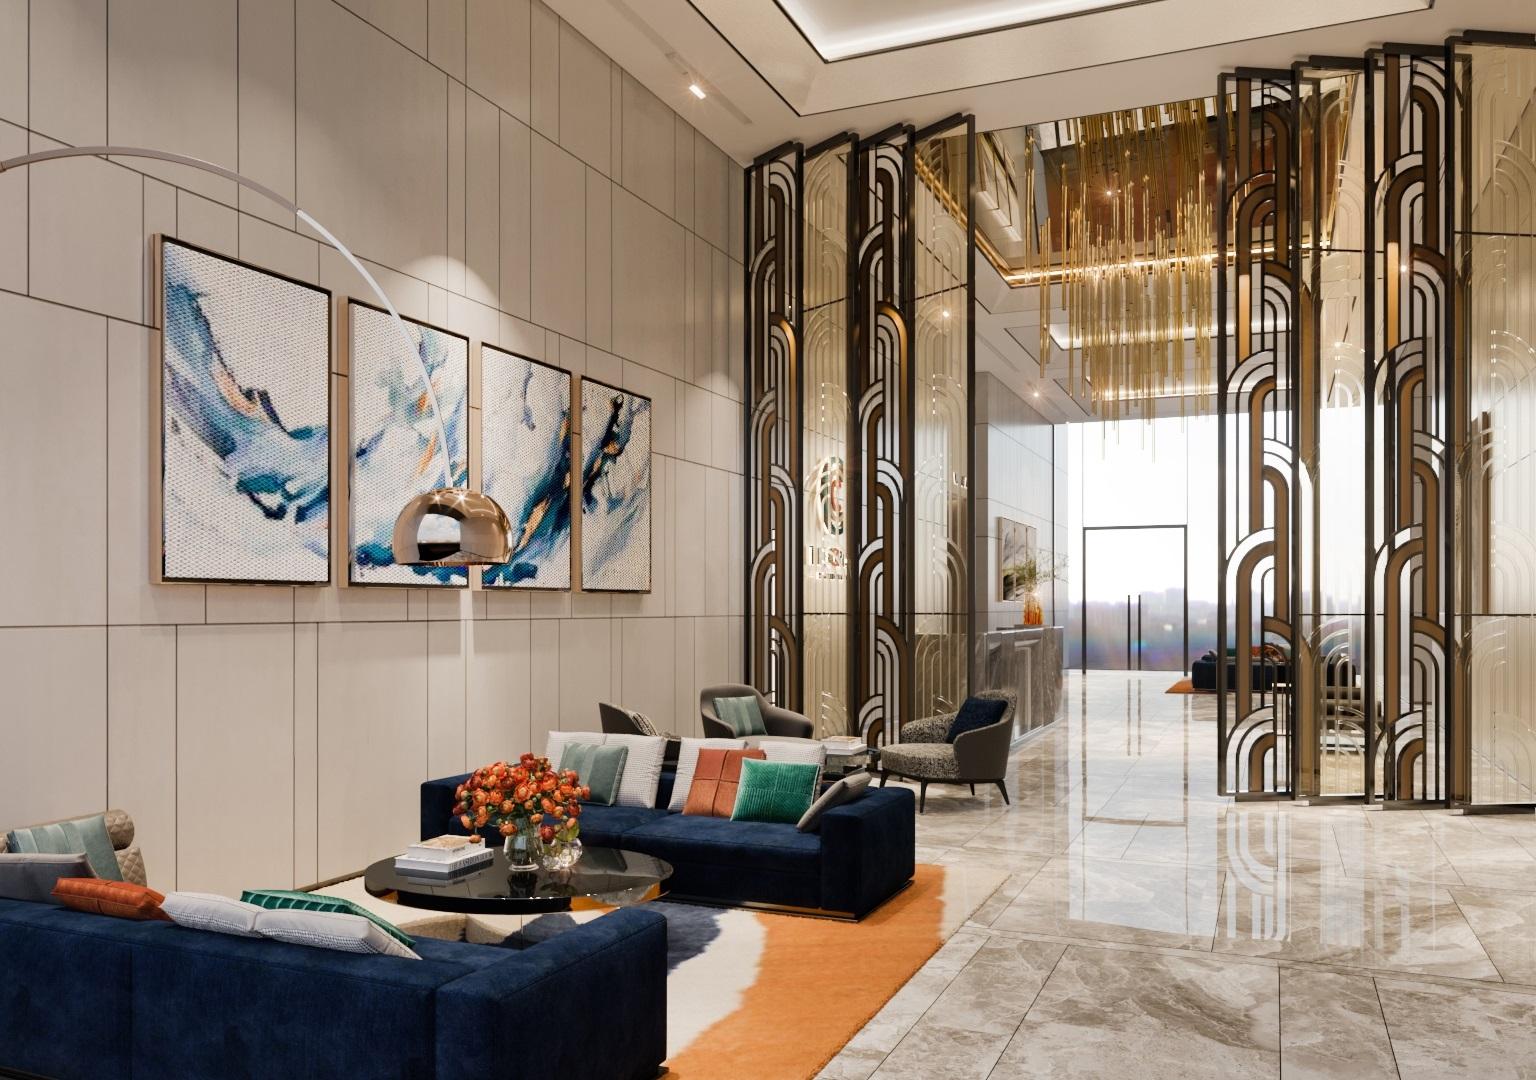 01-Lobby entrance